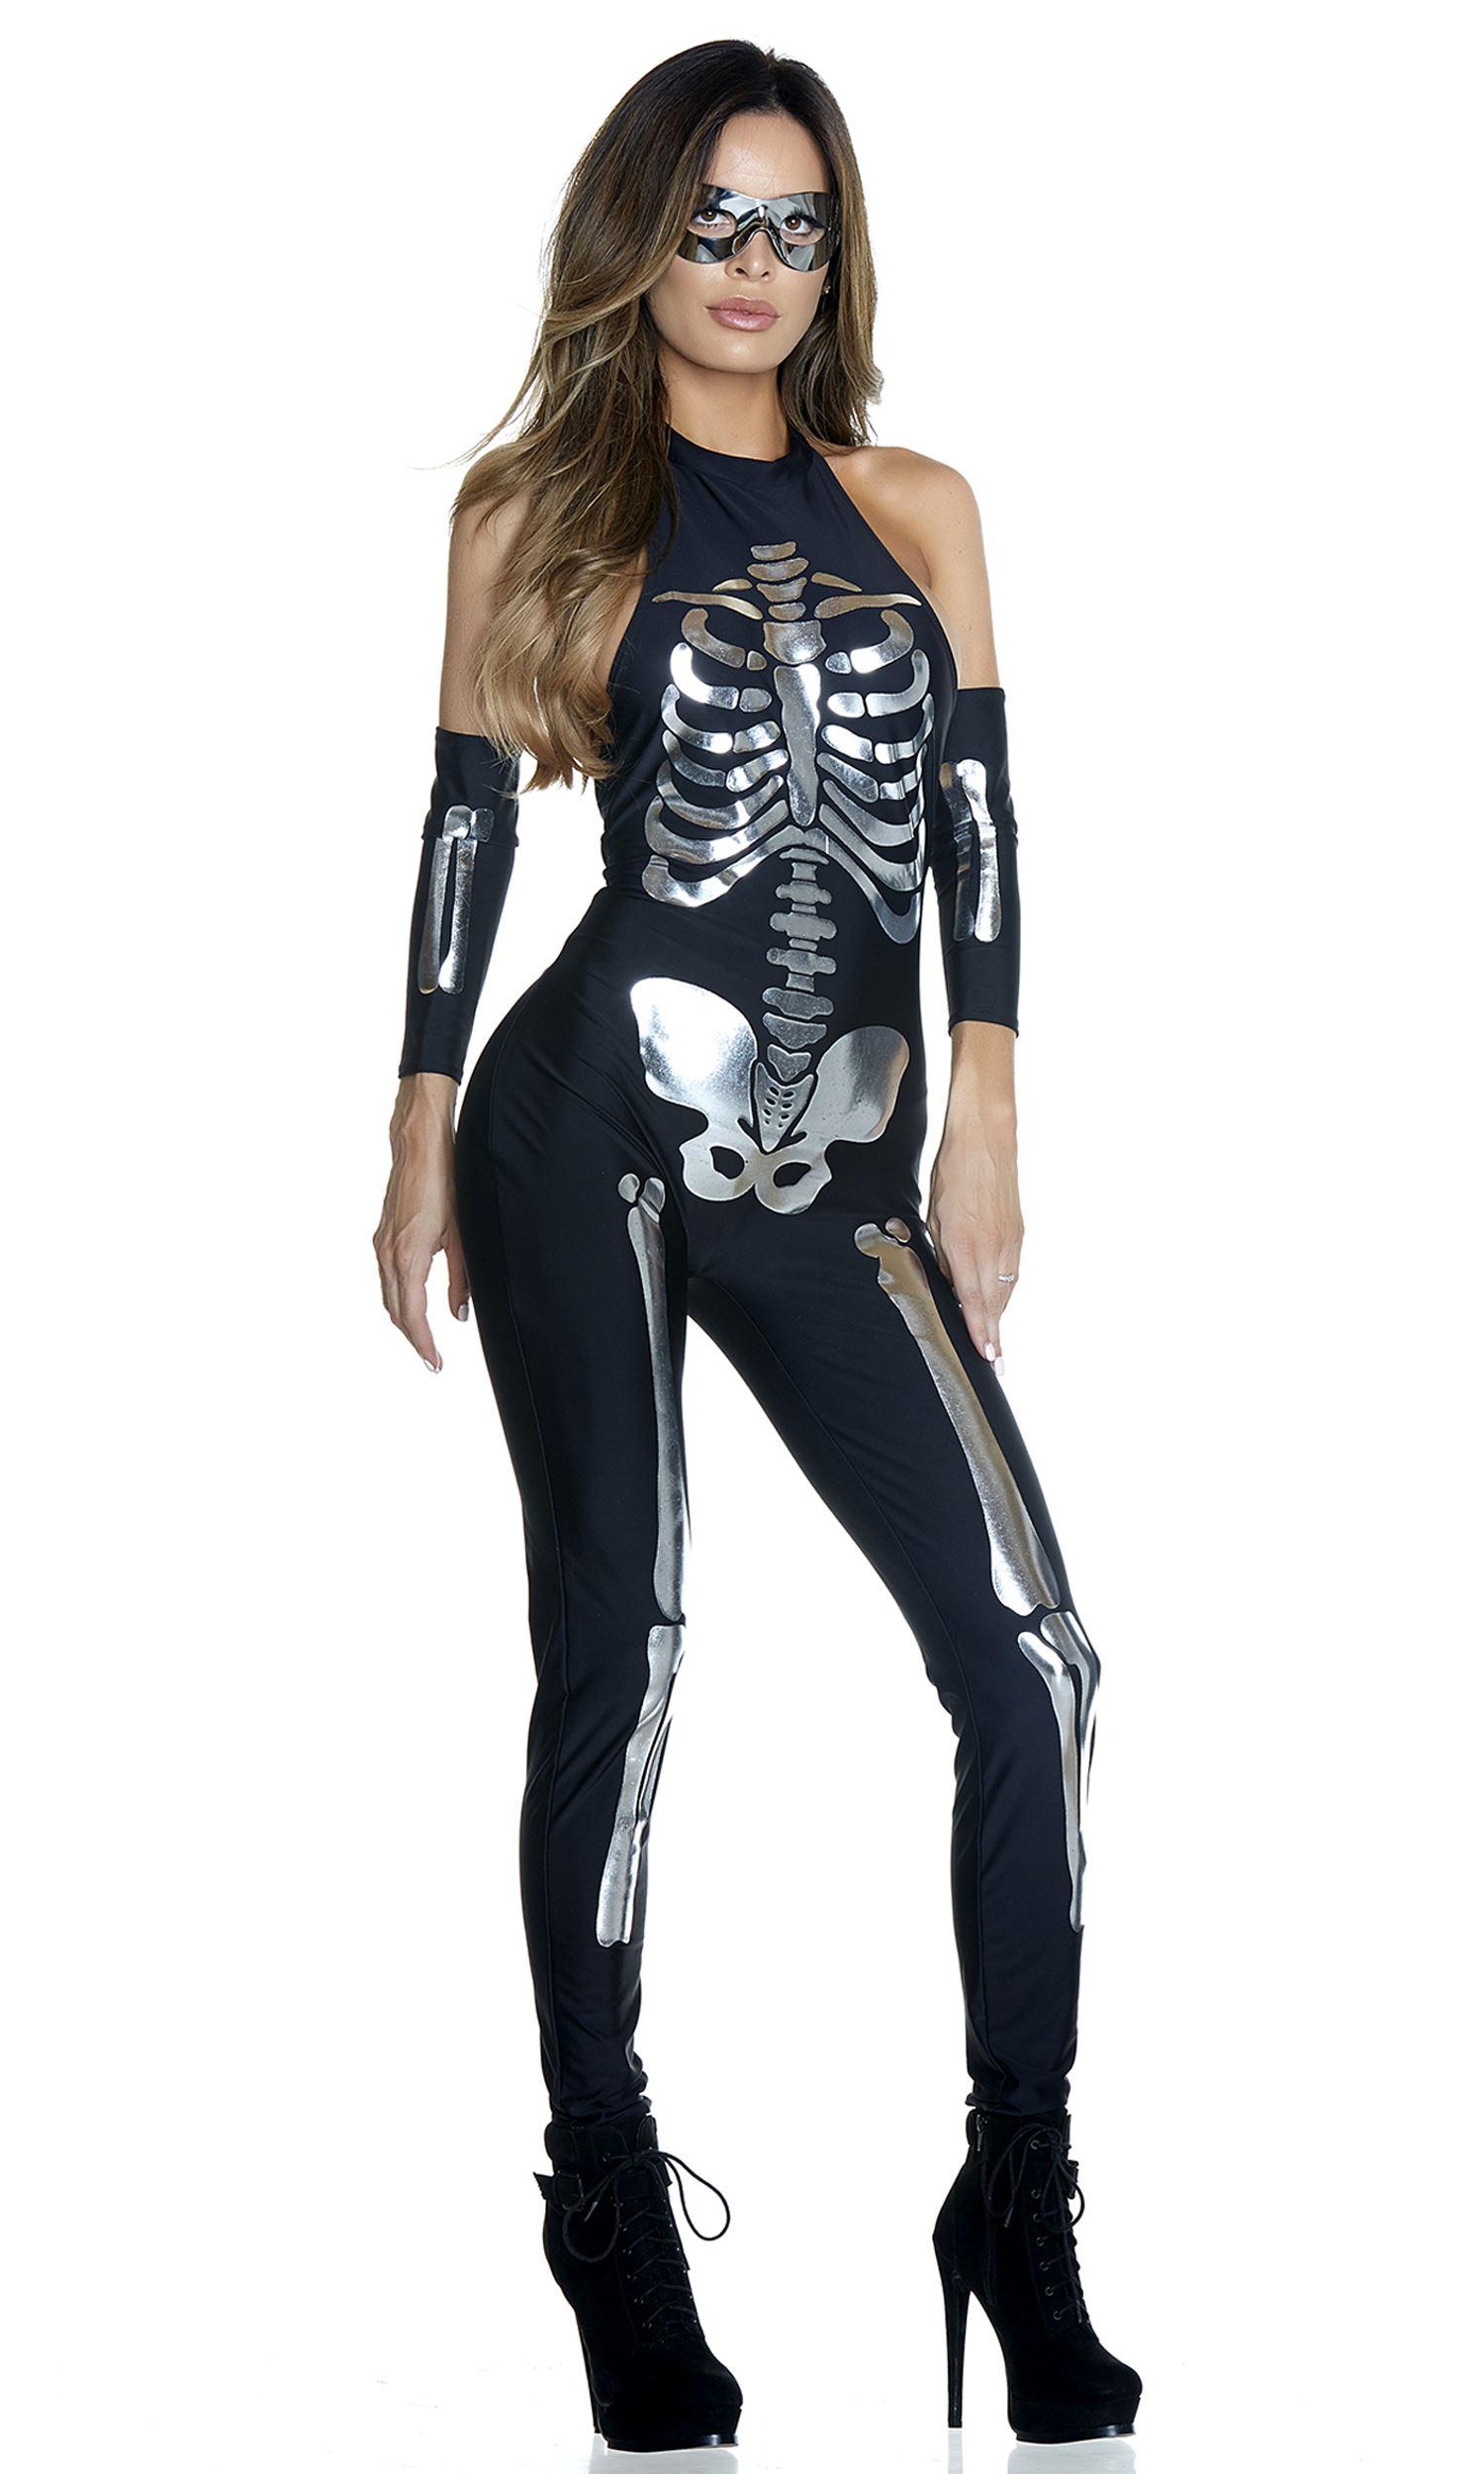 Skeleton Outfit Halloween.Adult Opulent Outline Skeleton Women Costume